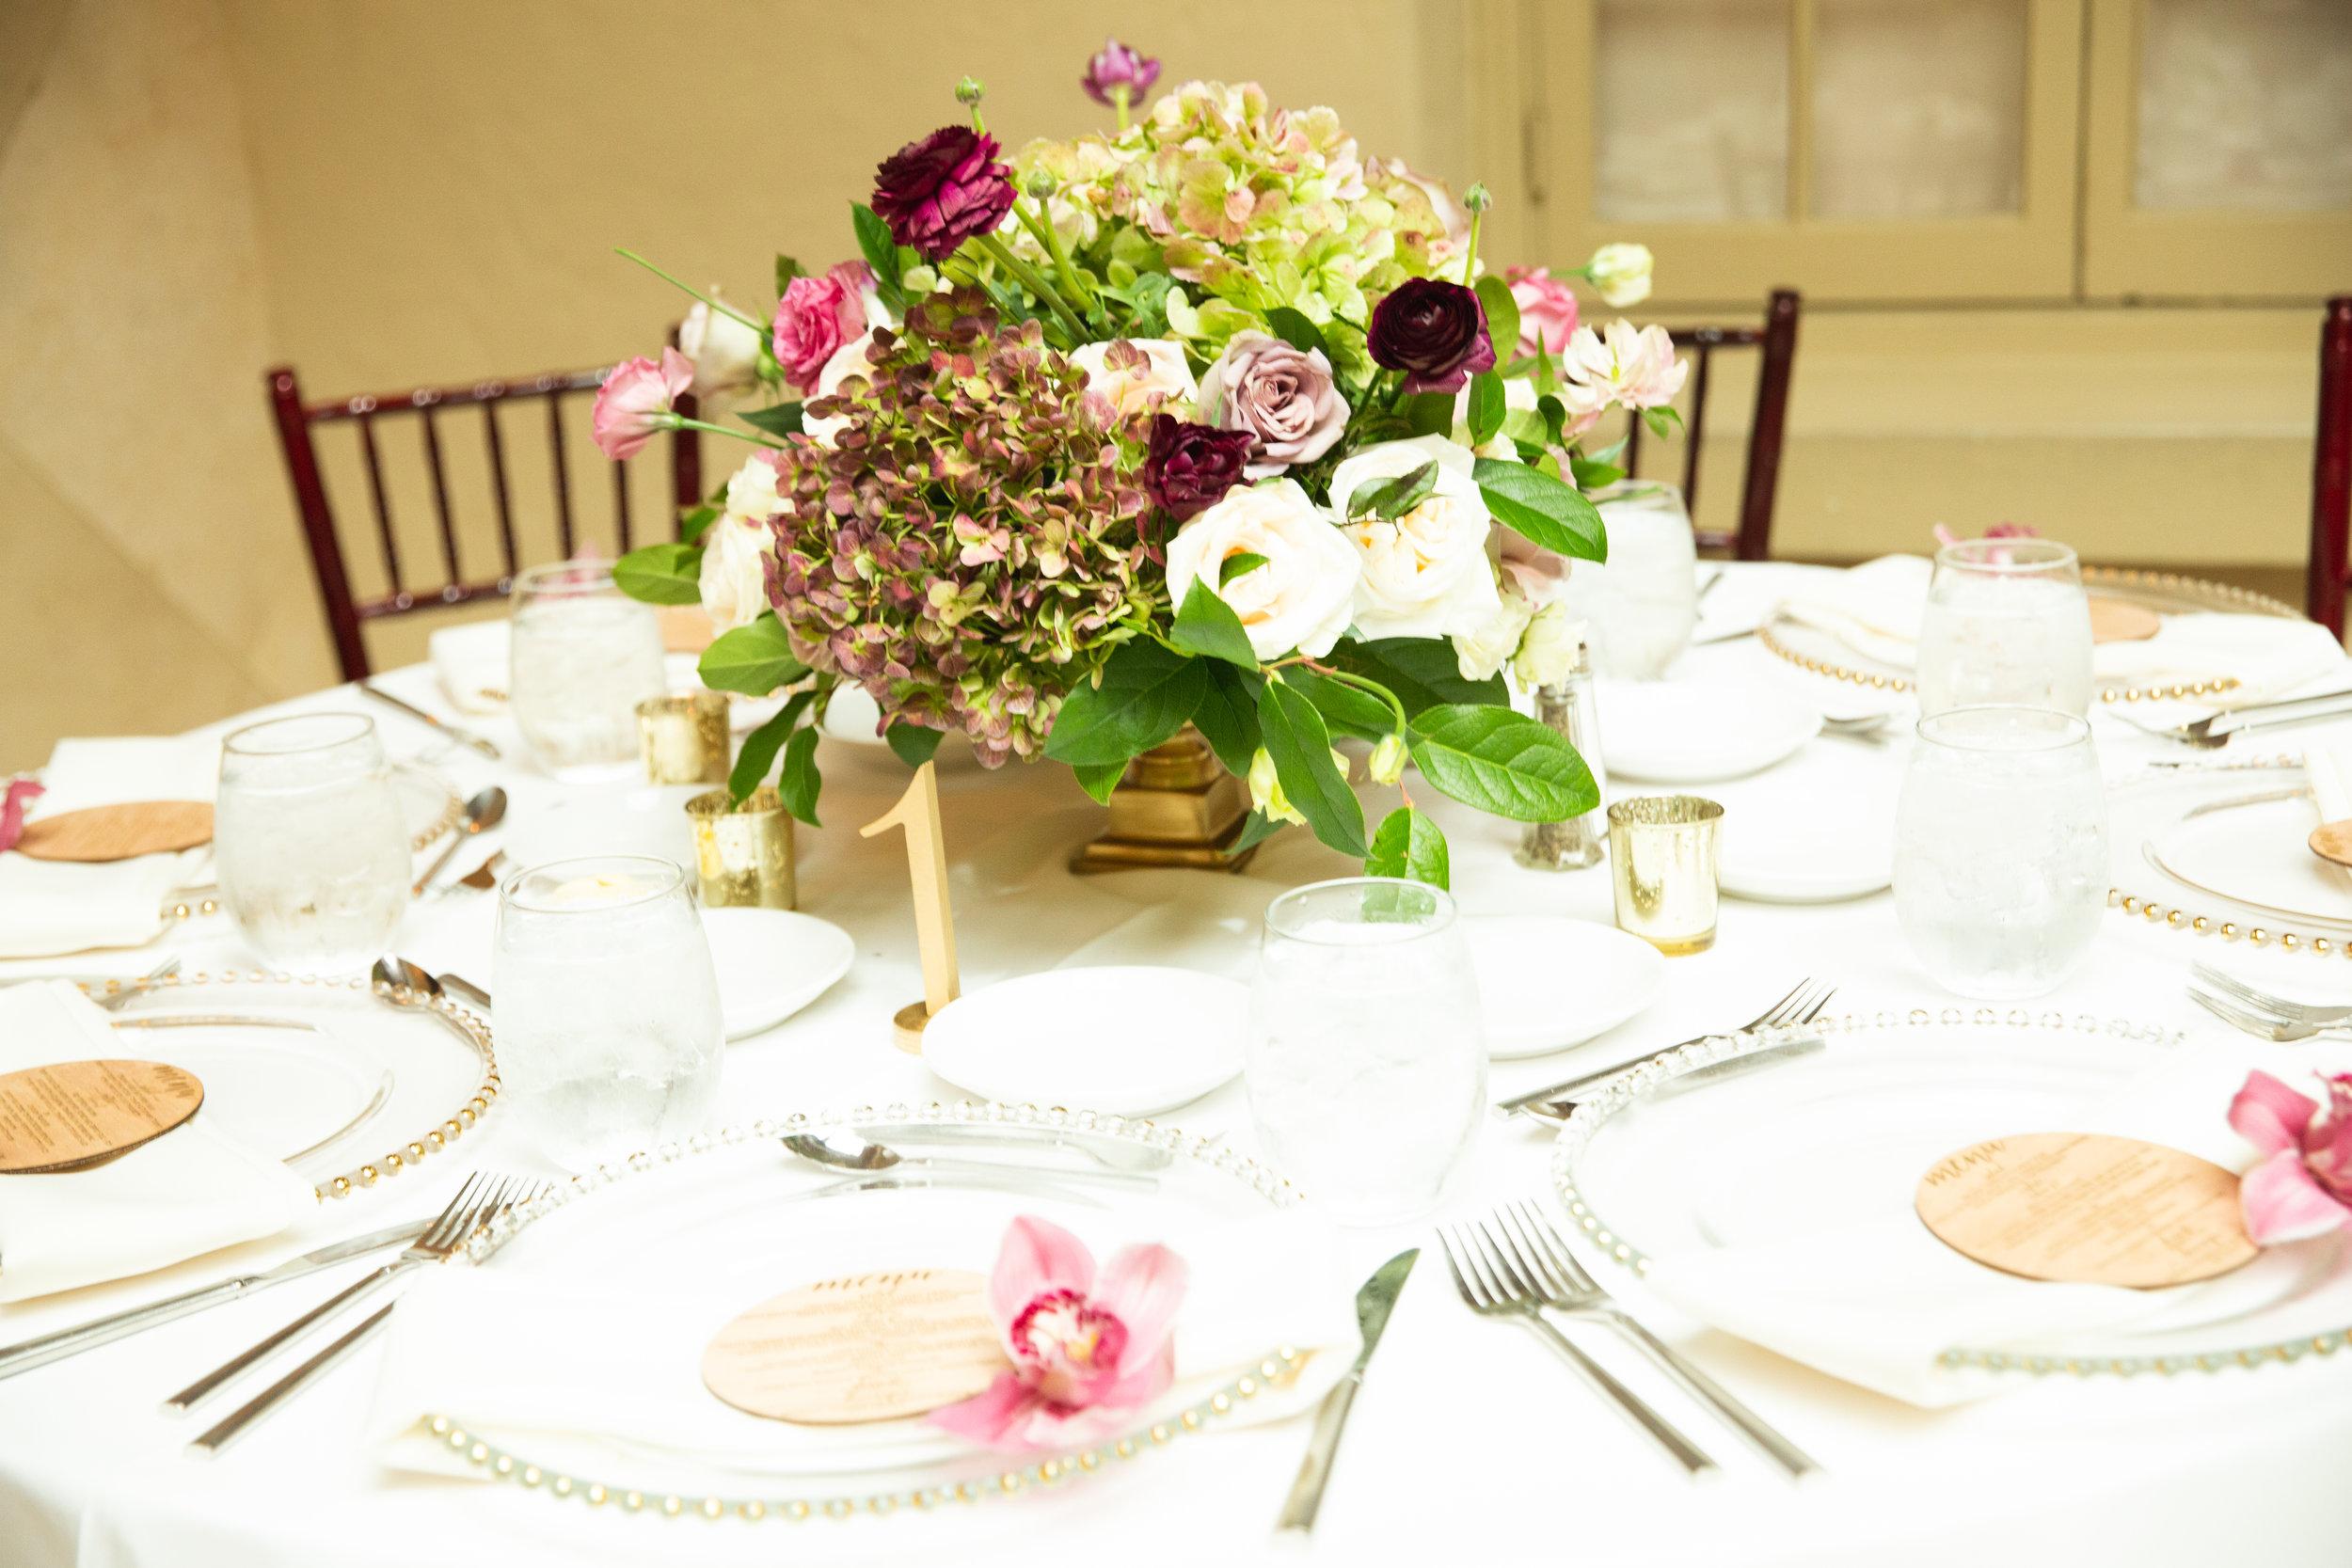 The Addison Boca Raton, South Florida Wedding, South Florida Wedding Florist, Low Centerpiece.jpg